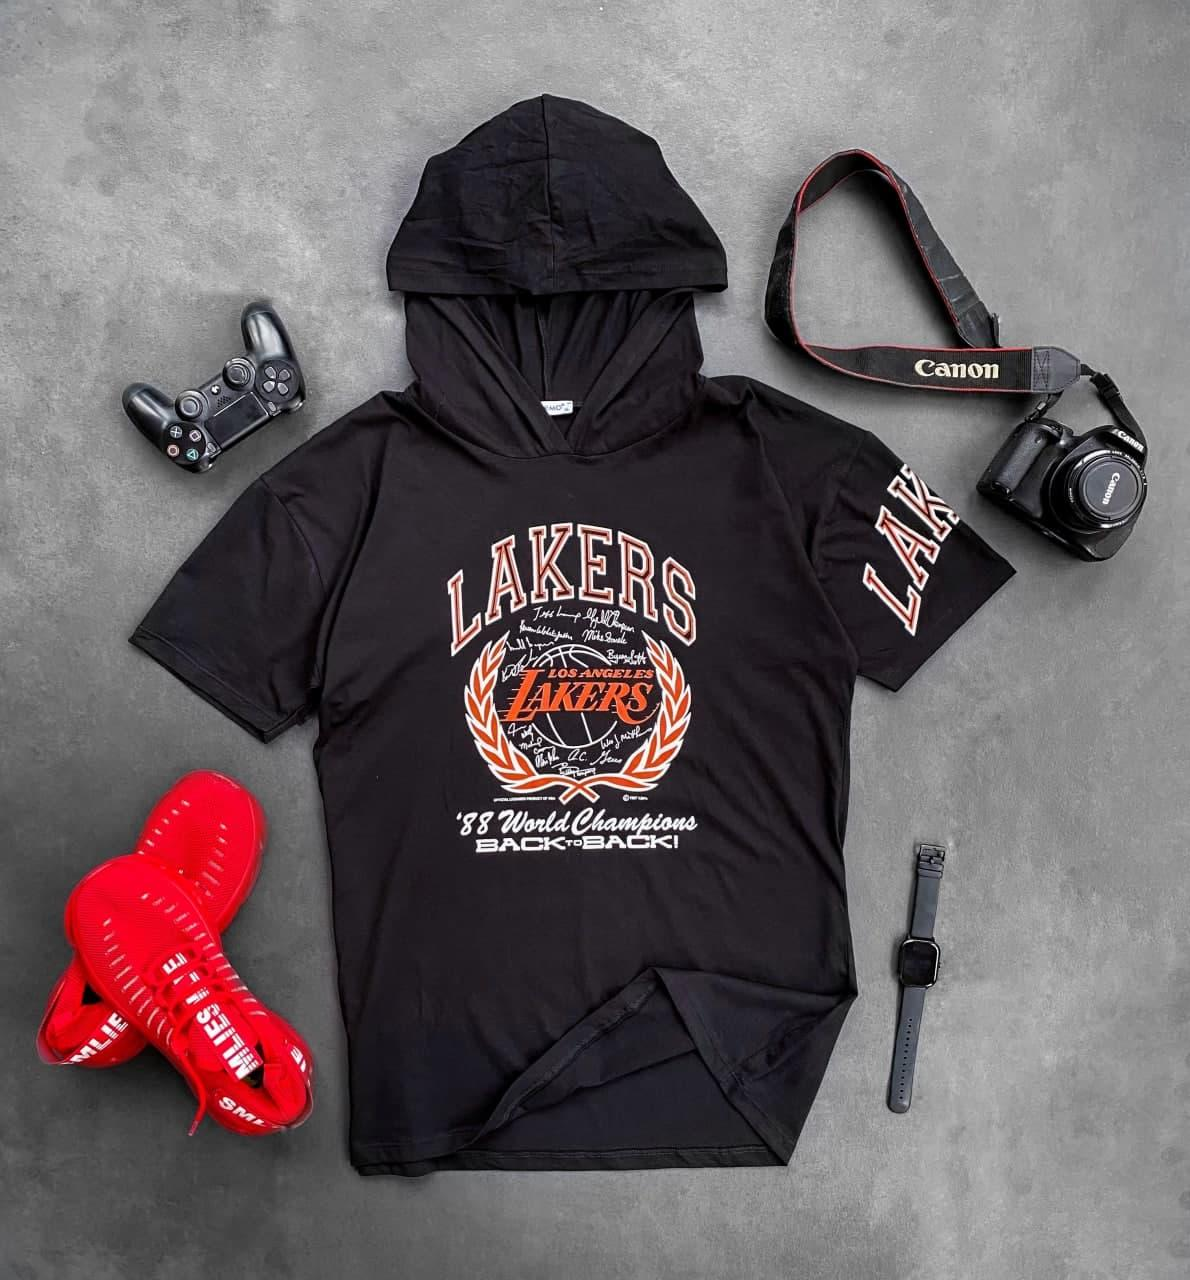 Мужская футболка с капюшоном Lakers (черная) Sfk3